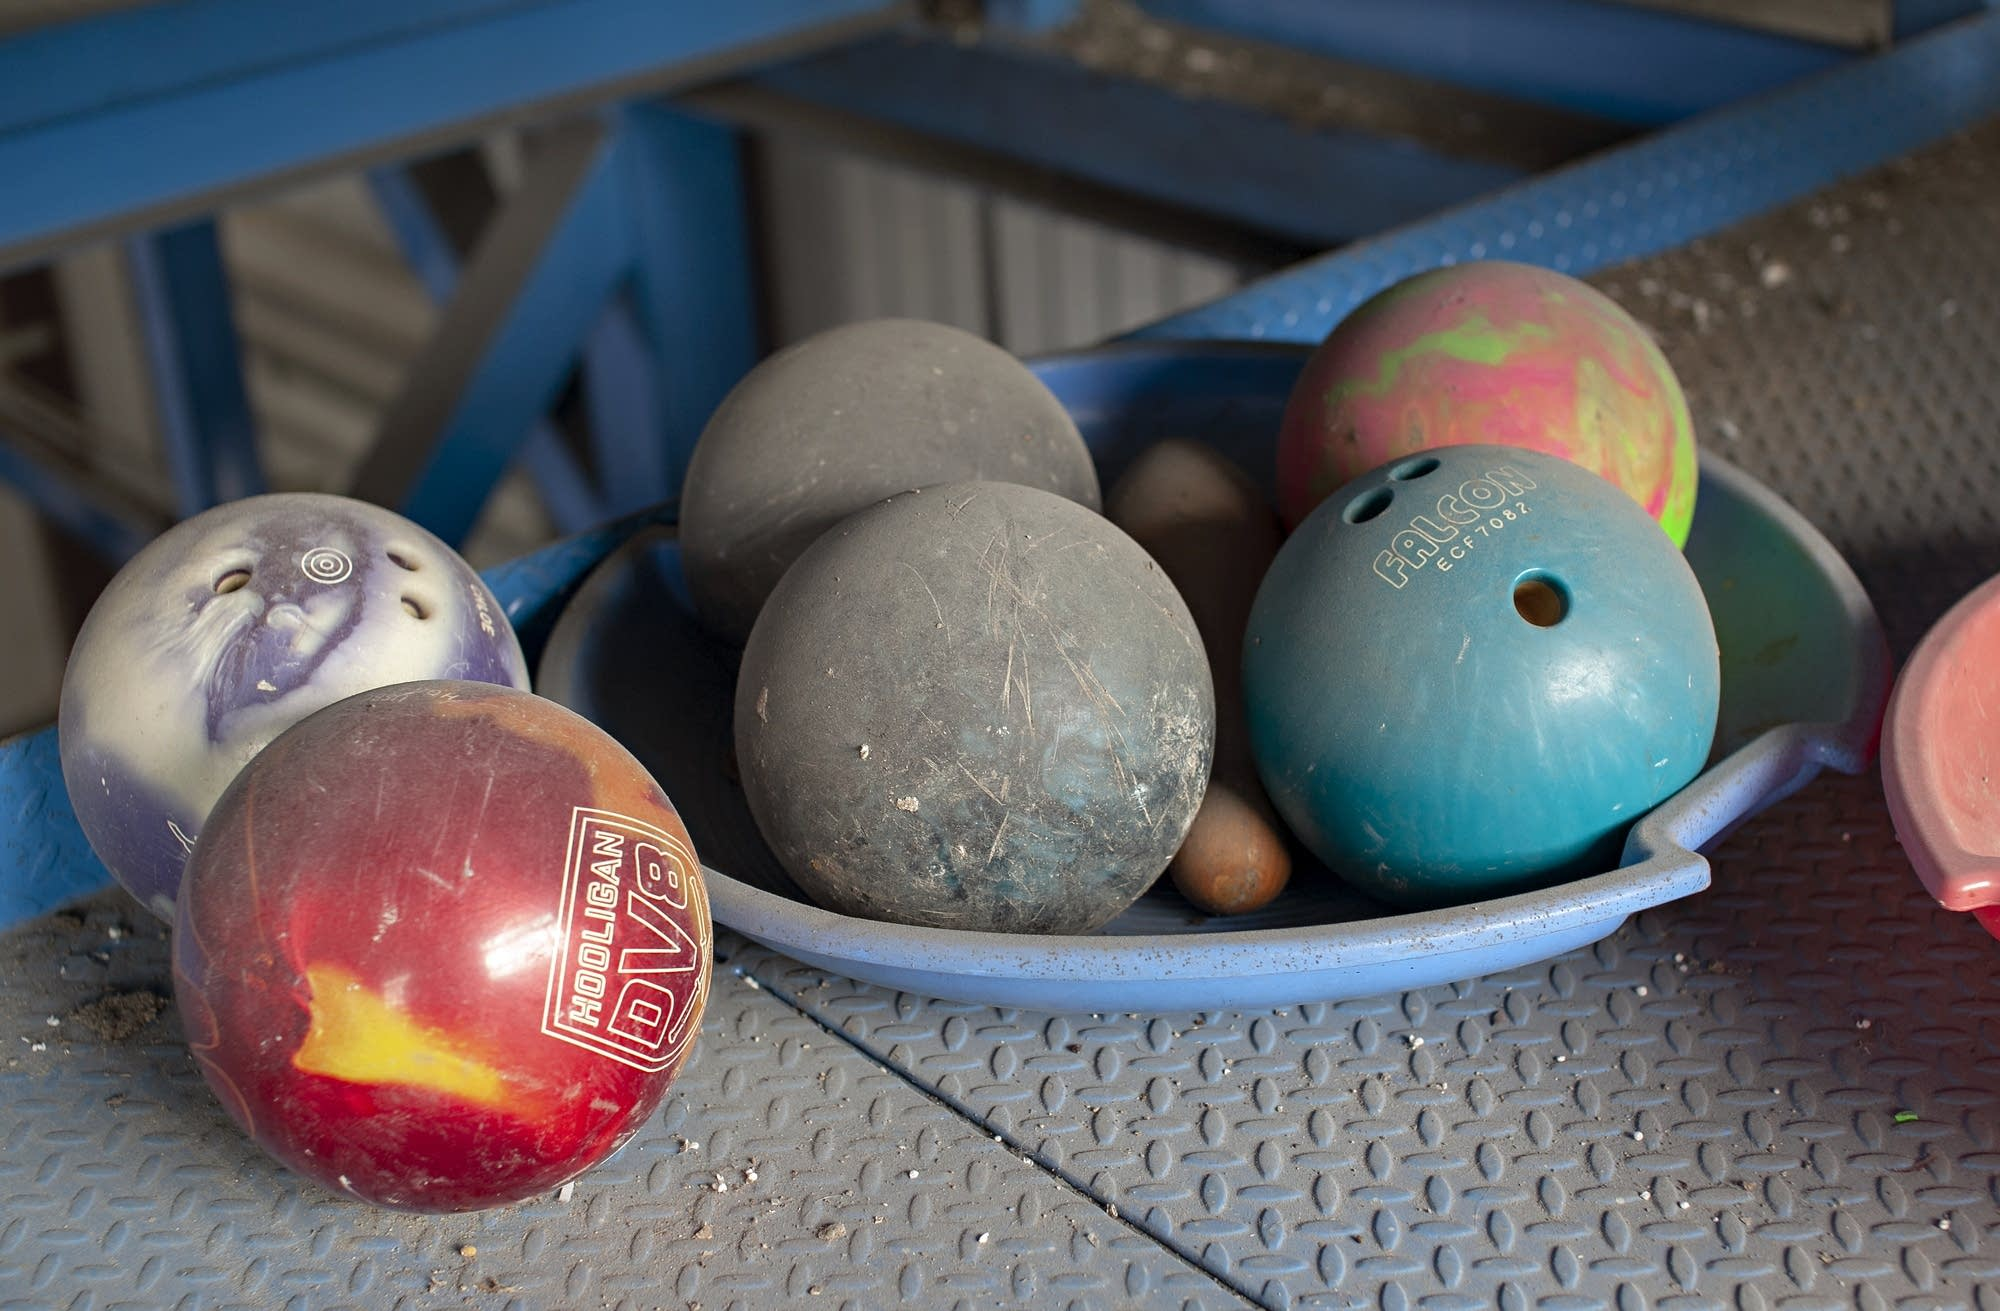 Bowling balls await disposal.